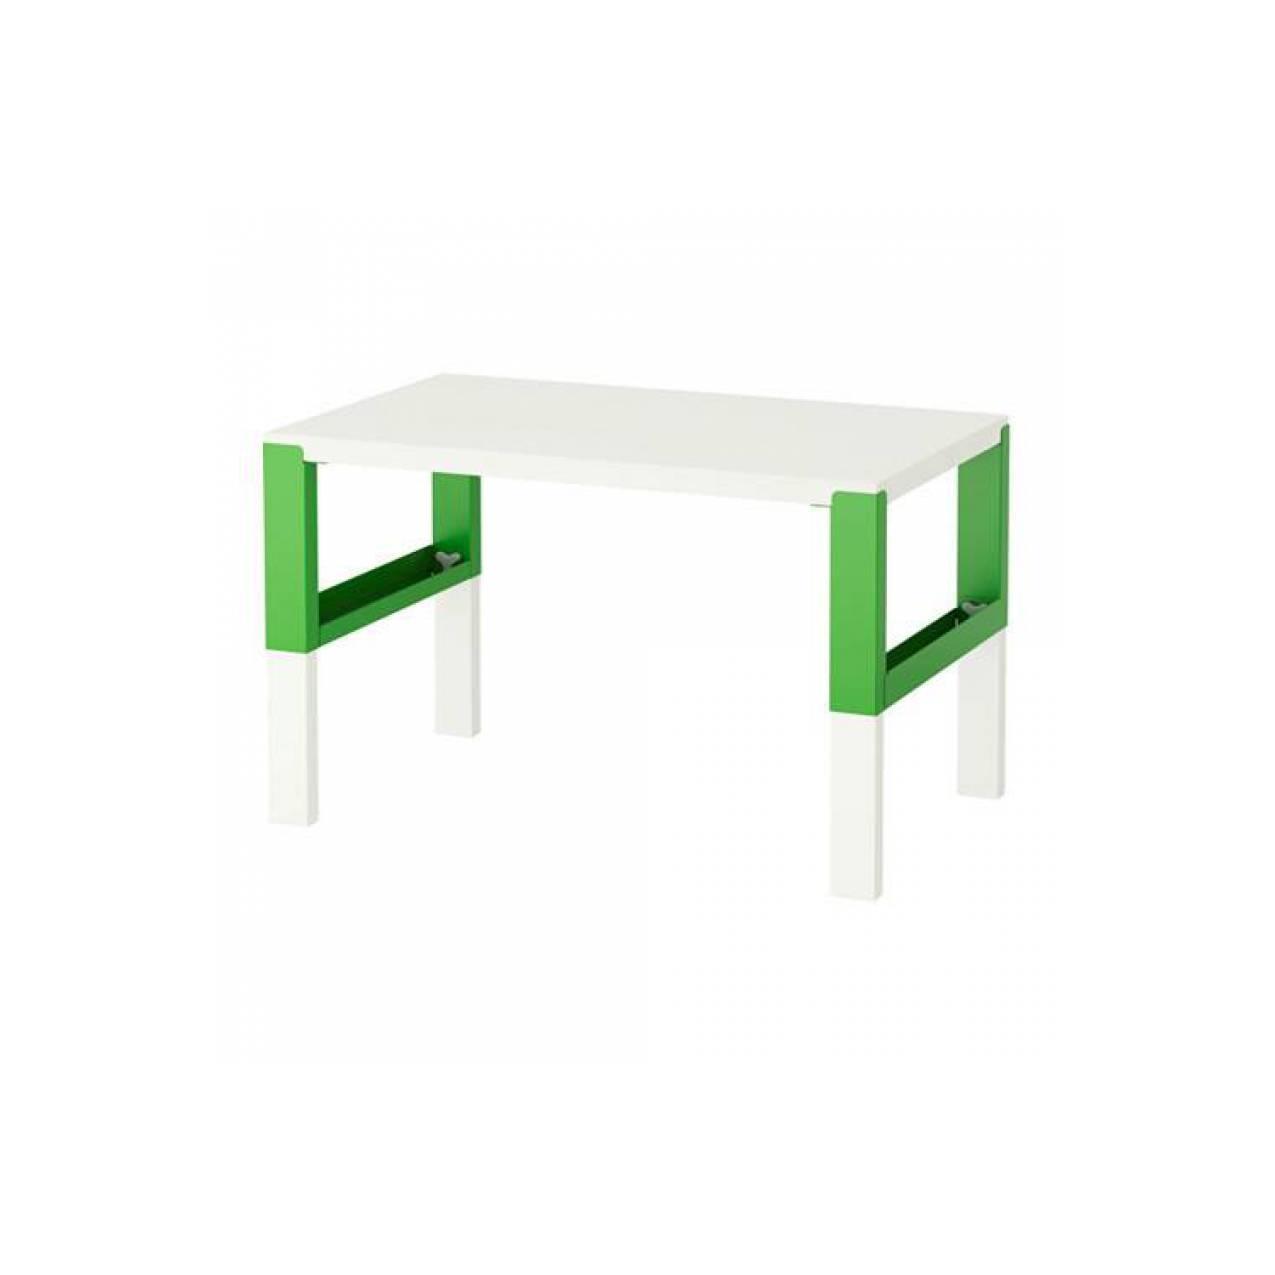 IKEA PAHL Meja Belajar Anak 96x58 cm - Hijau, putih